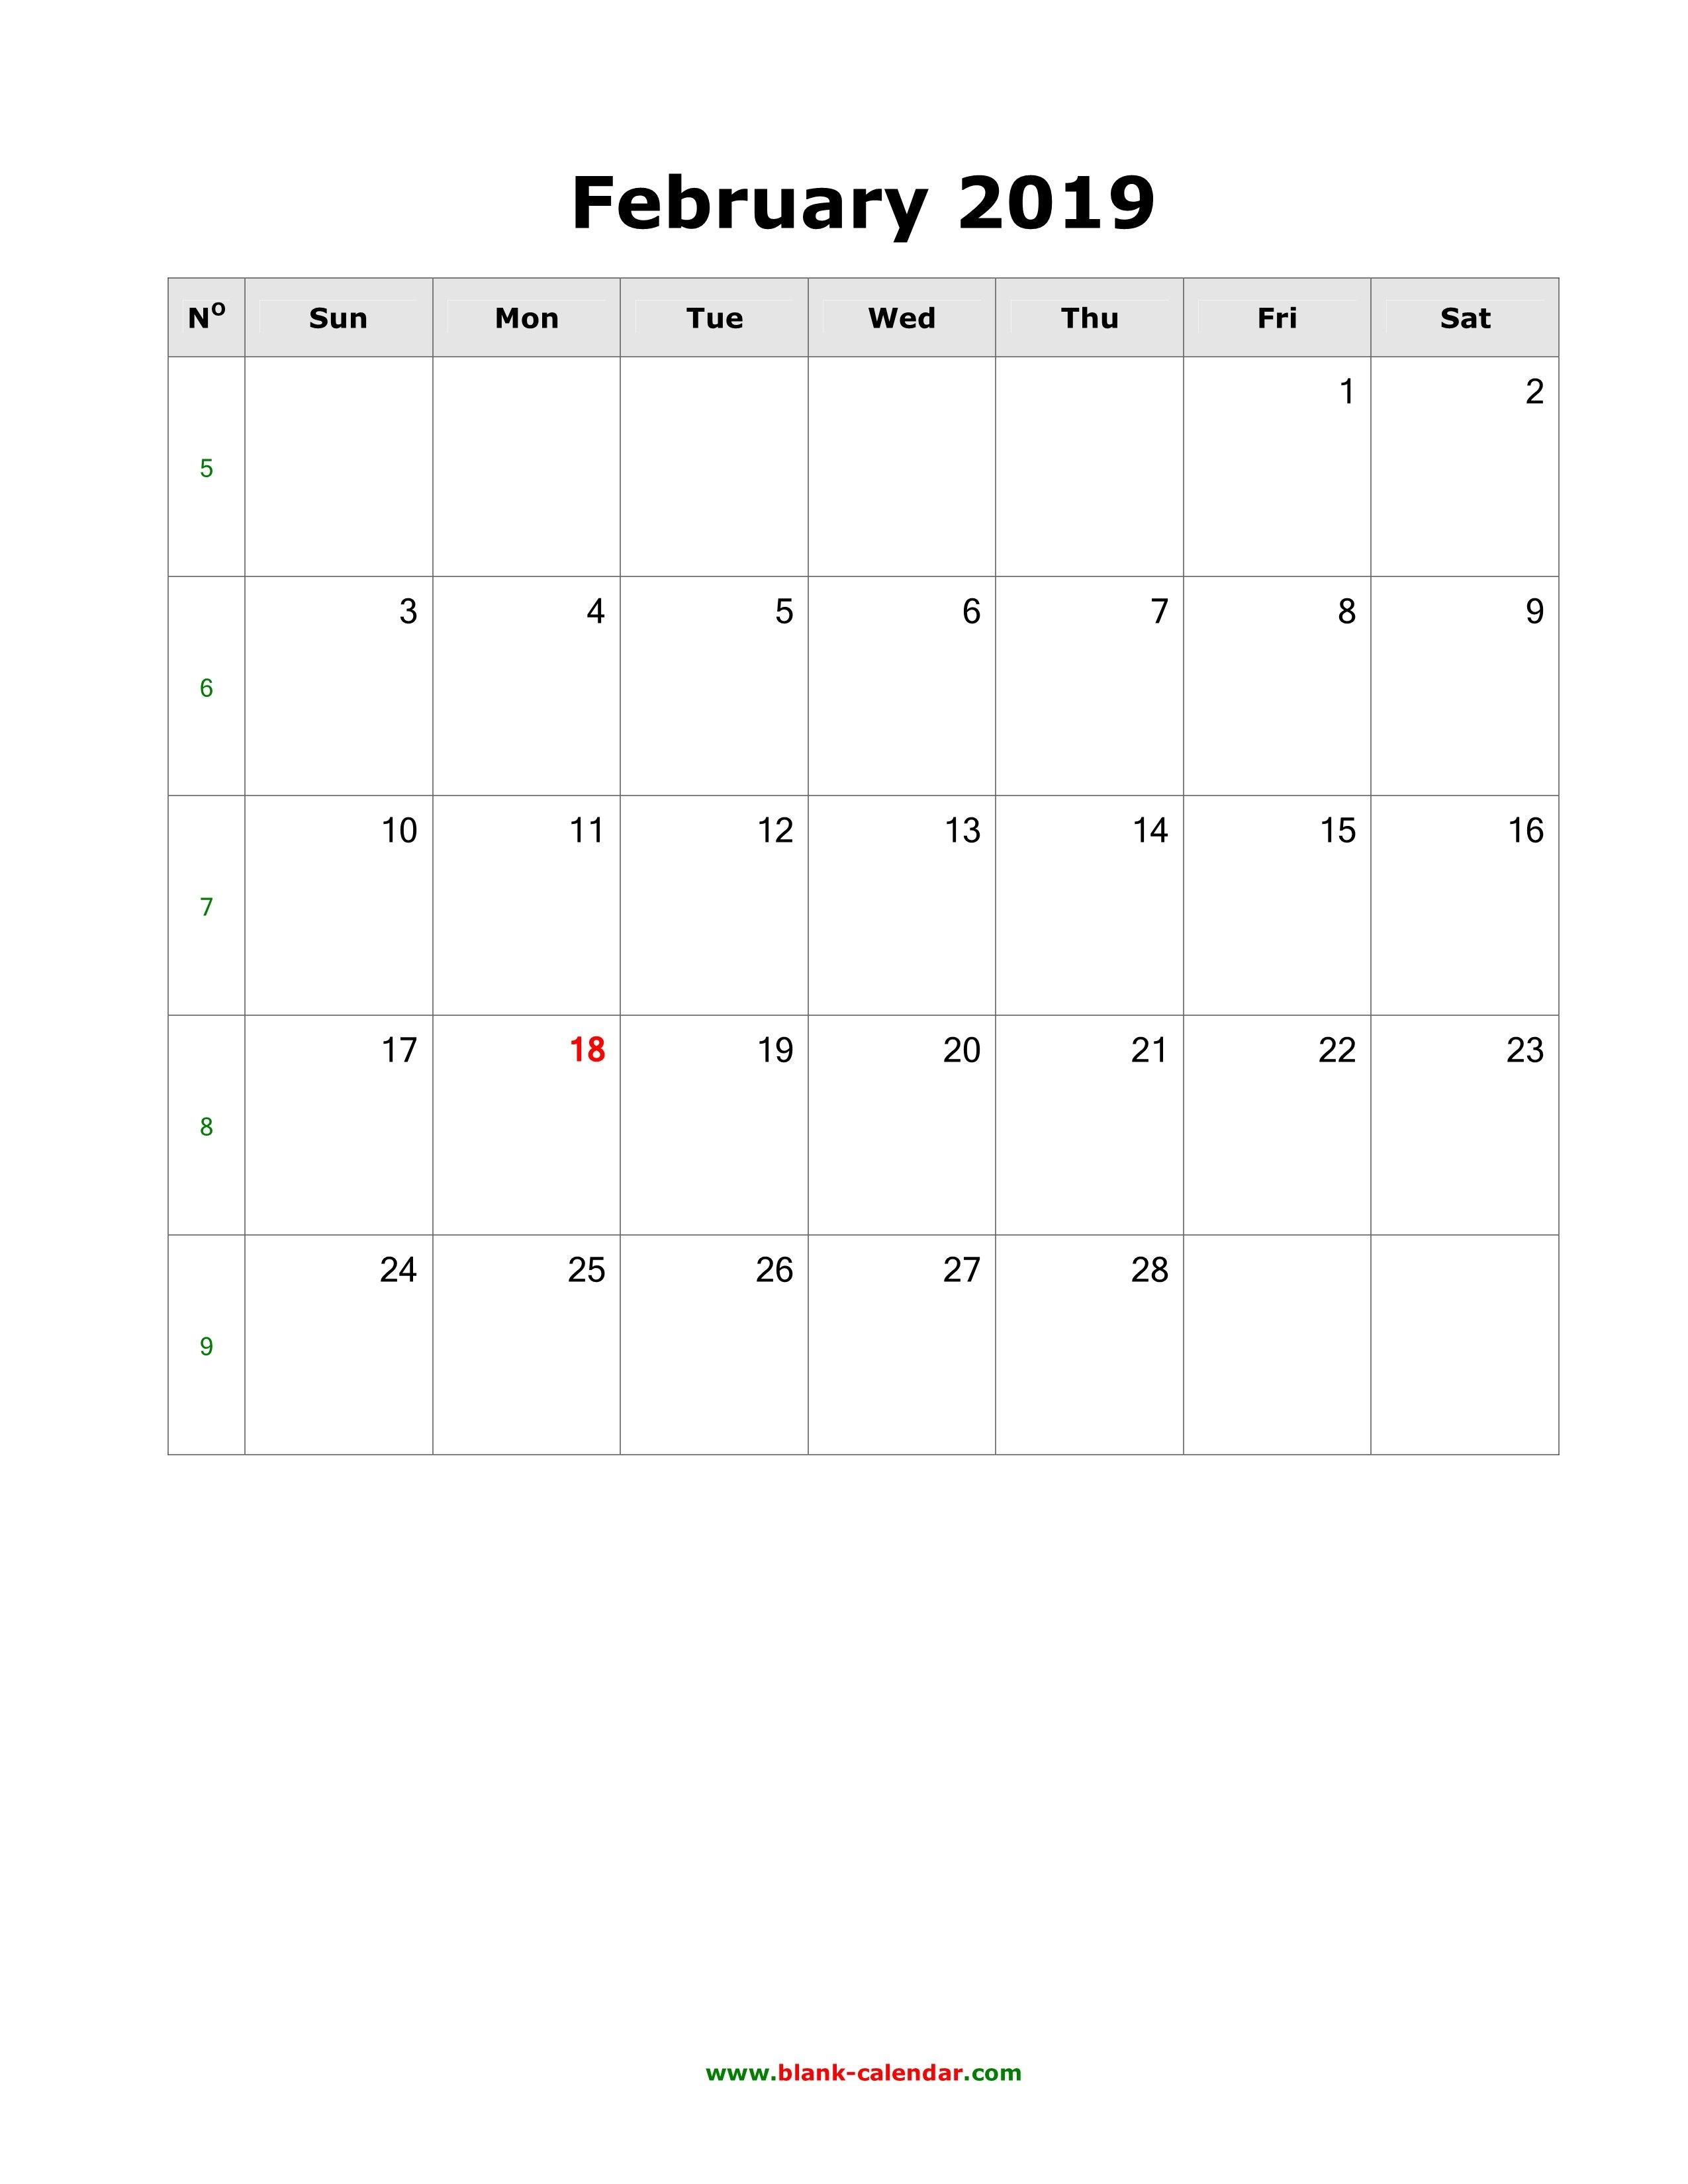 Download February 2019 Blank Calendar (Vertical) Calendar 2019 Portrait